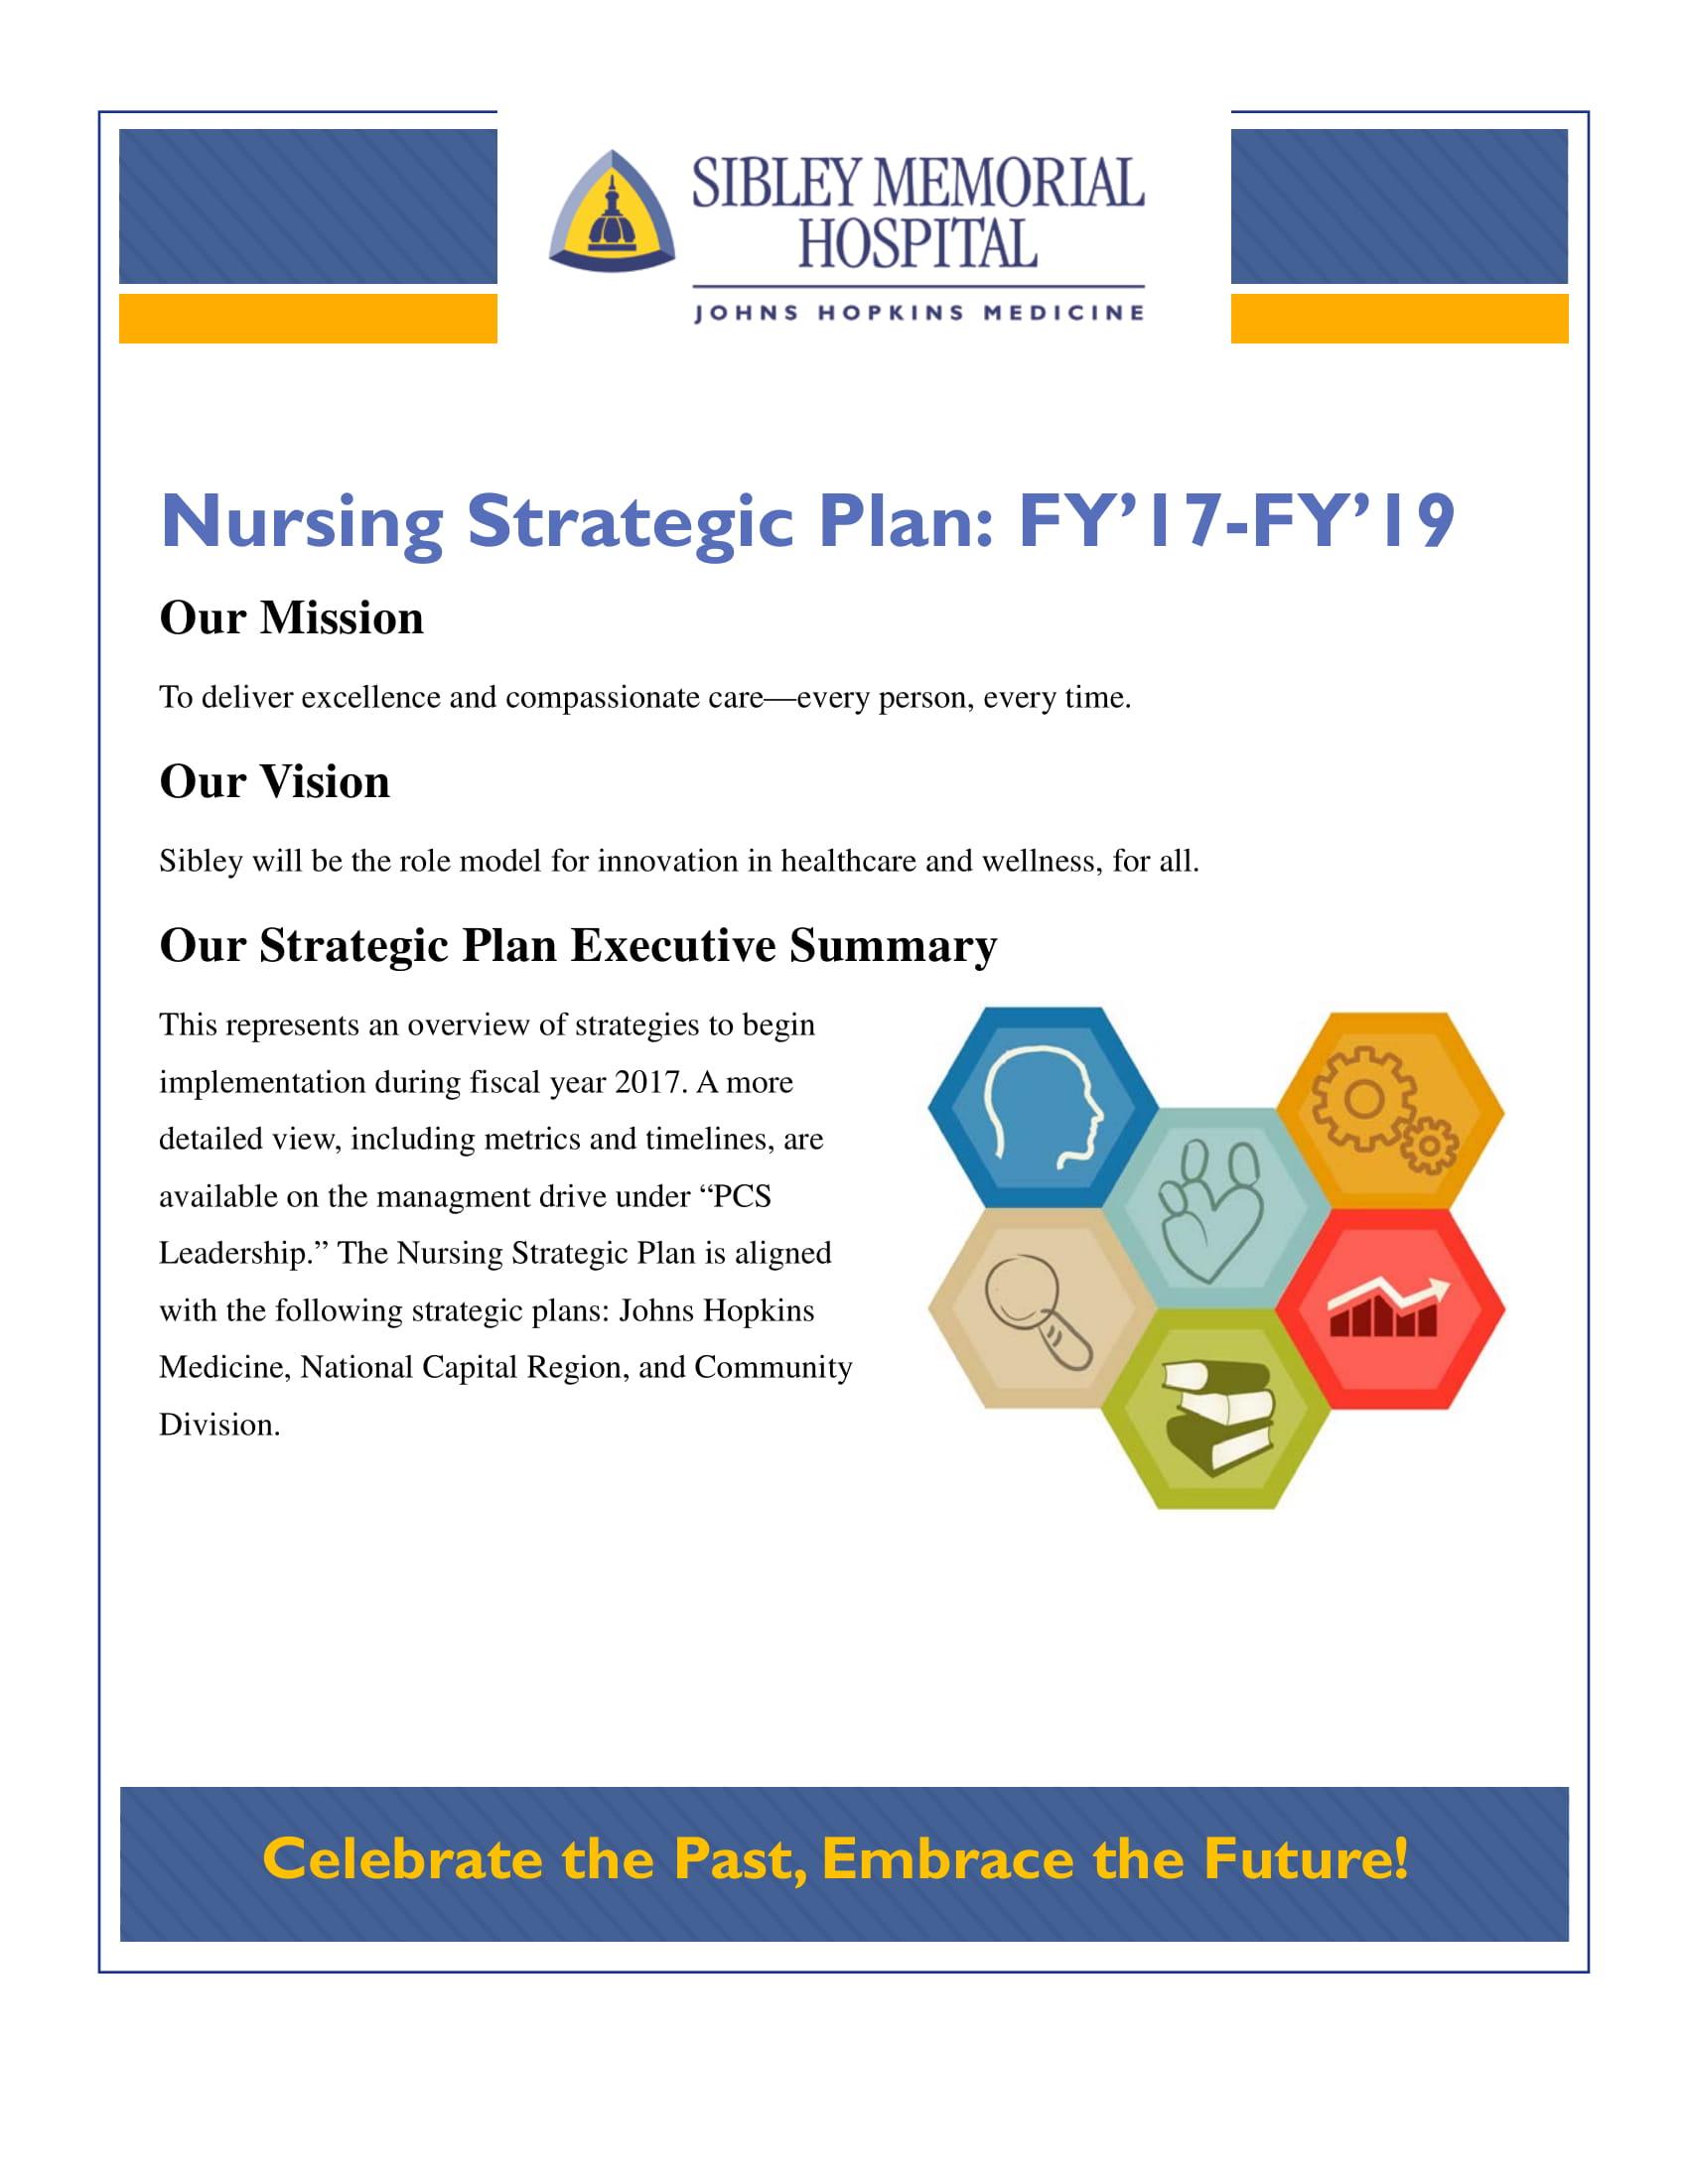 comprehensive nursing strategic plan example 1